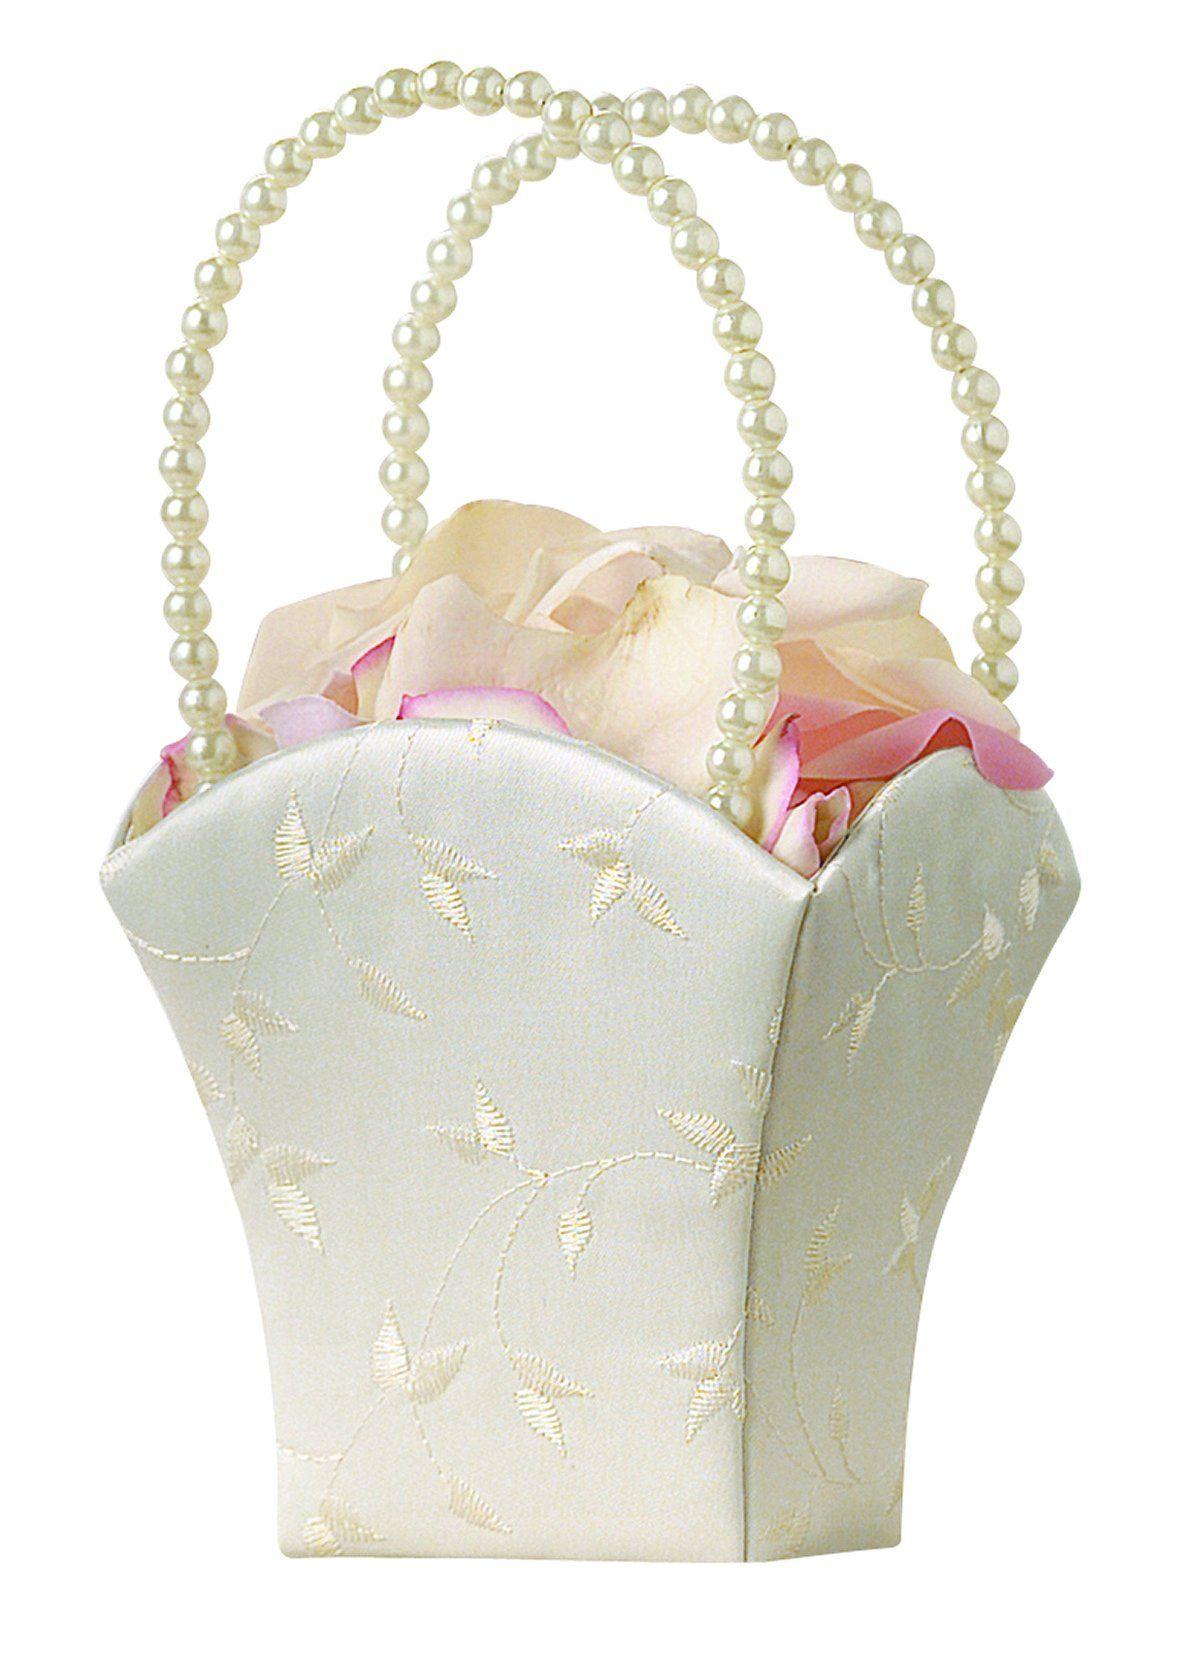 Lillian rose embroidery elegant wedding flower basket